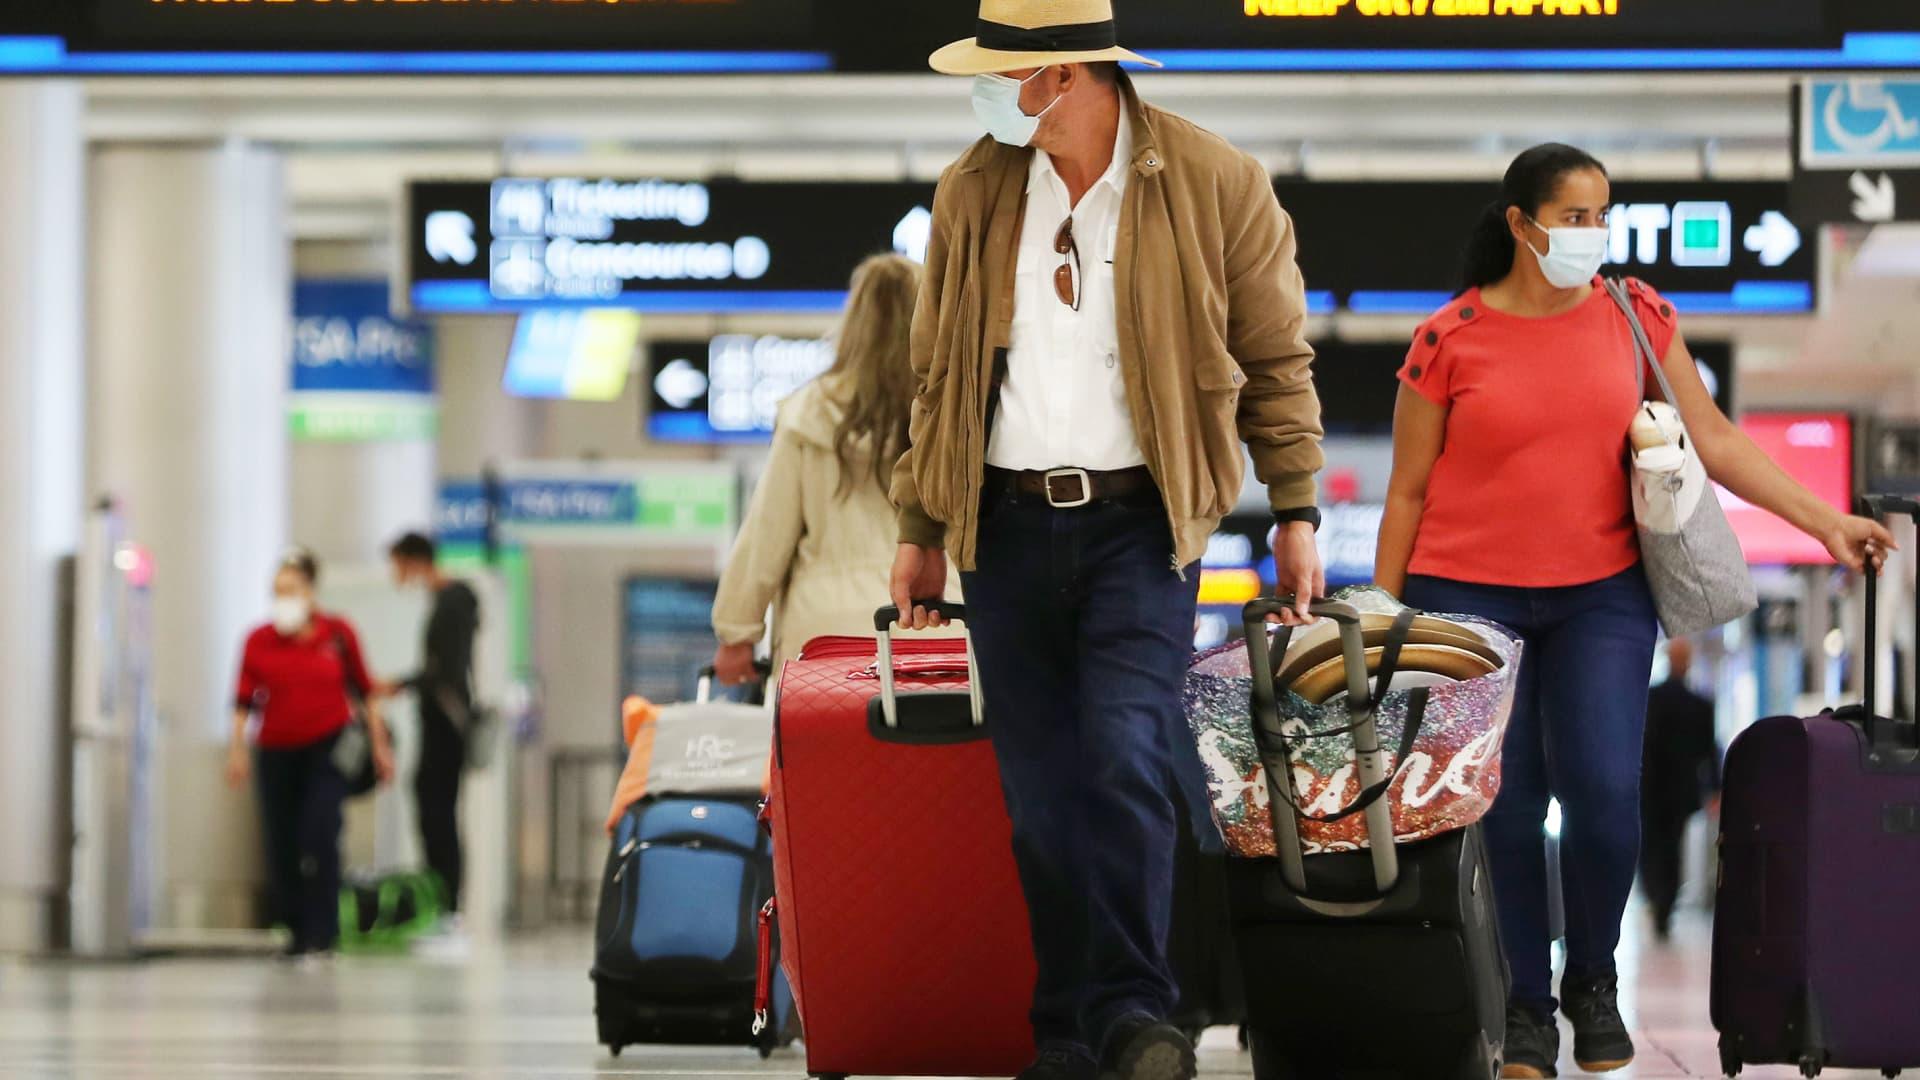 Travelers walk through Miami International Airport on February 01, 2021 in Miami, Florida.